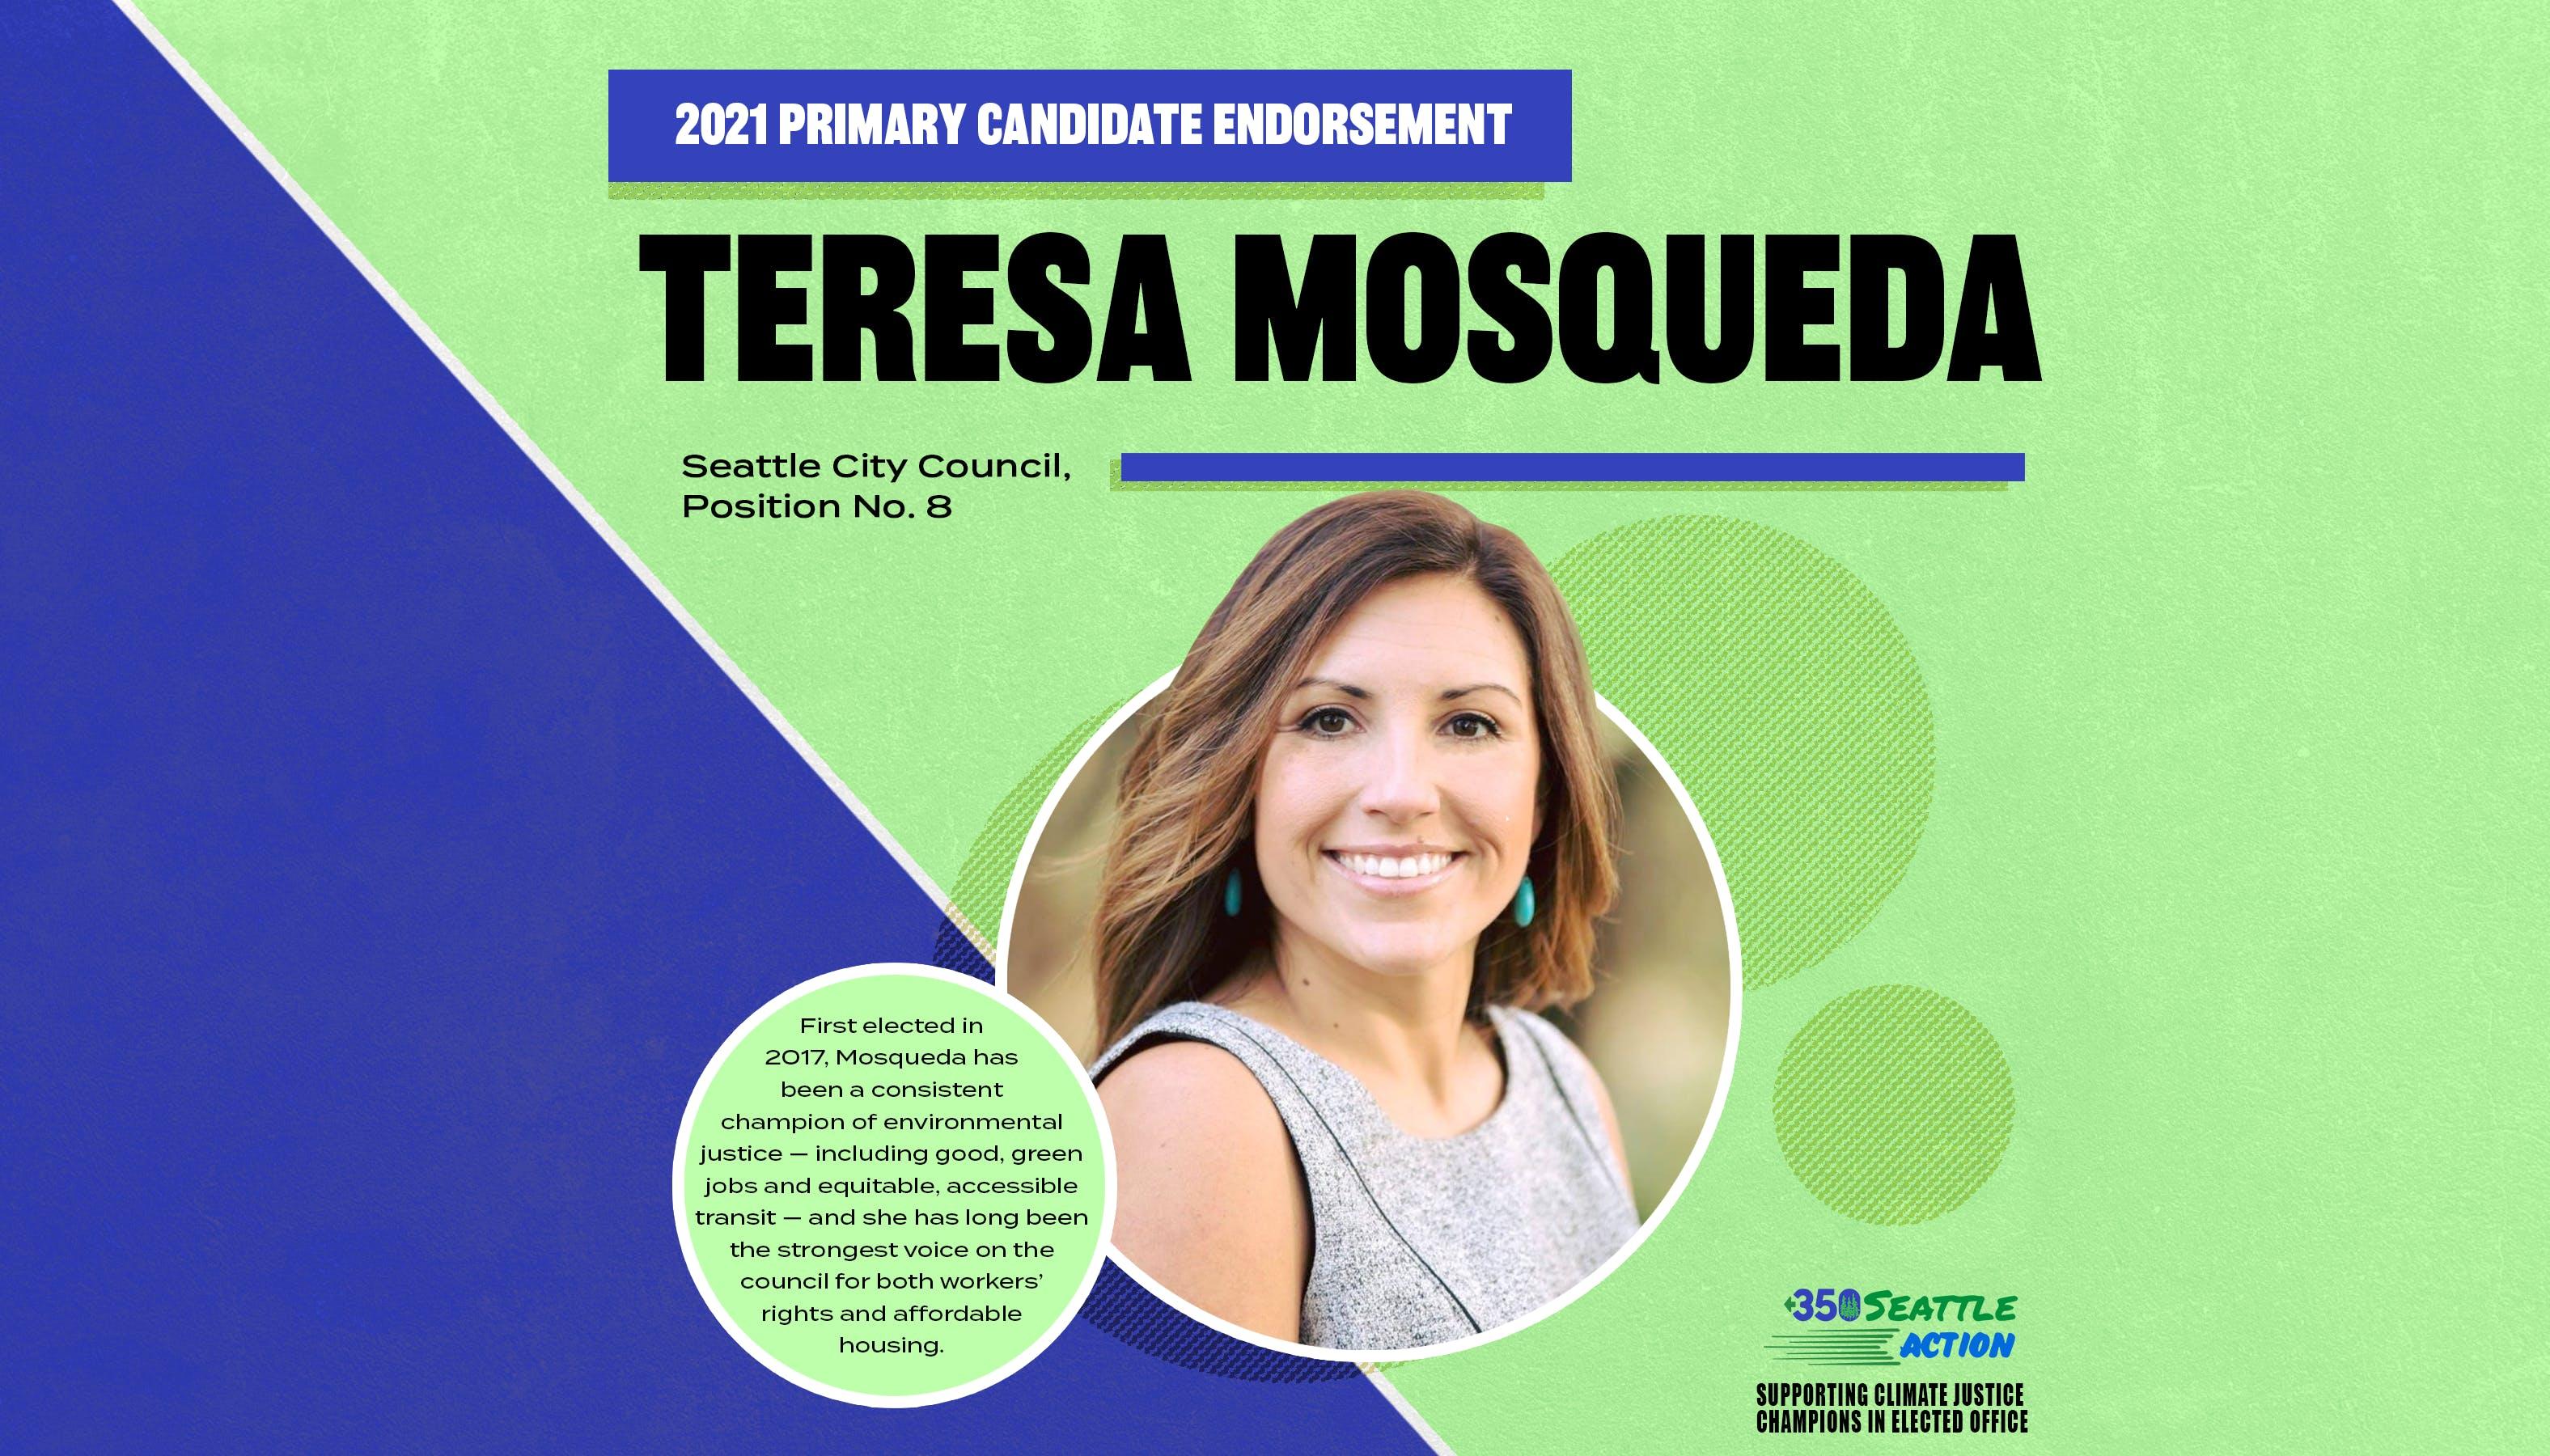 Teresa Mosqueda Twitter.png